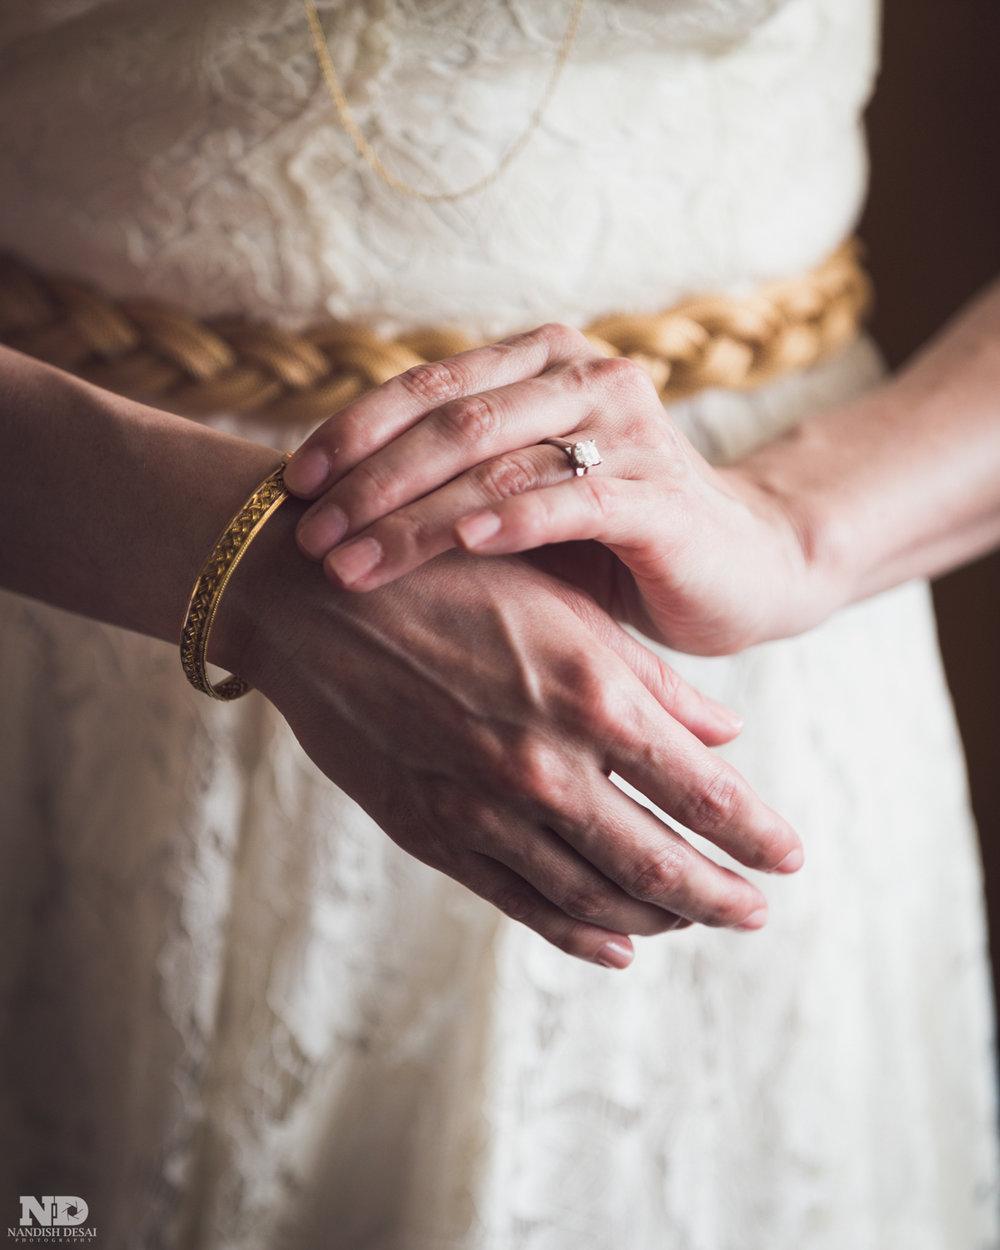 Nandish Desai Photography Weddings 1.jpg